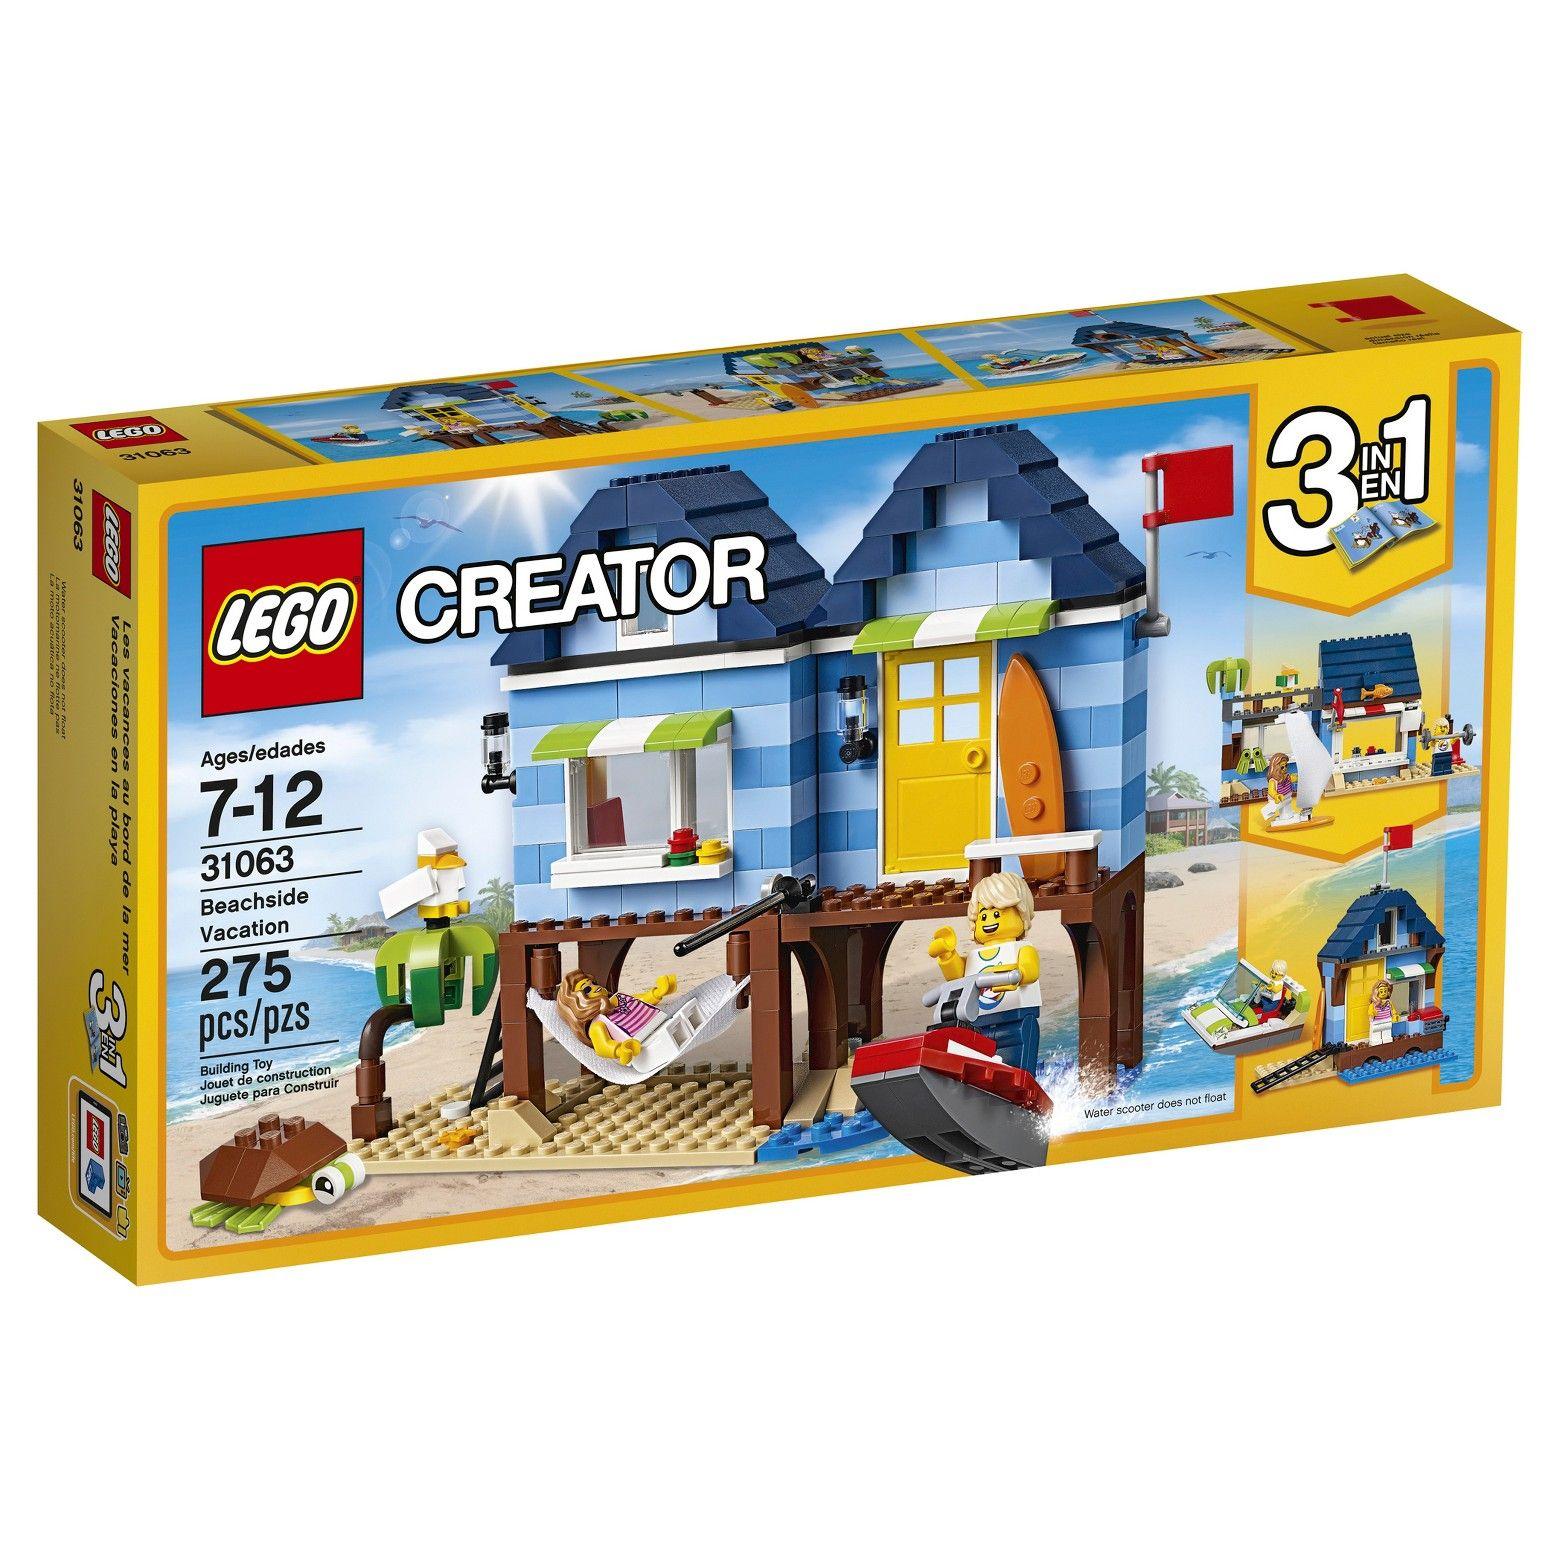 Lego Creator Beachside Vacation 31063 Br Enjoy The Beach Life With The 3 In 1 Beachside Vacation Have Summer Fun With T Lego Creator Lego Creator Sets Lego